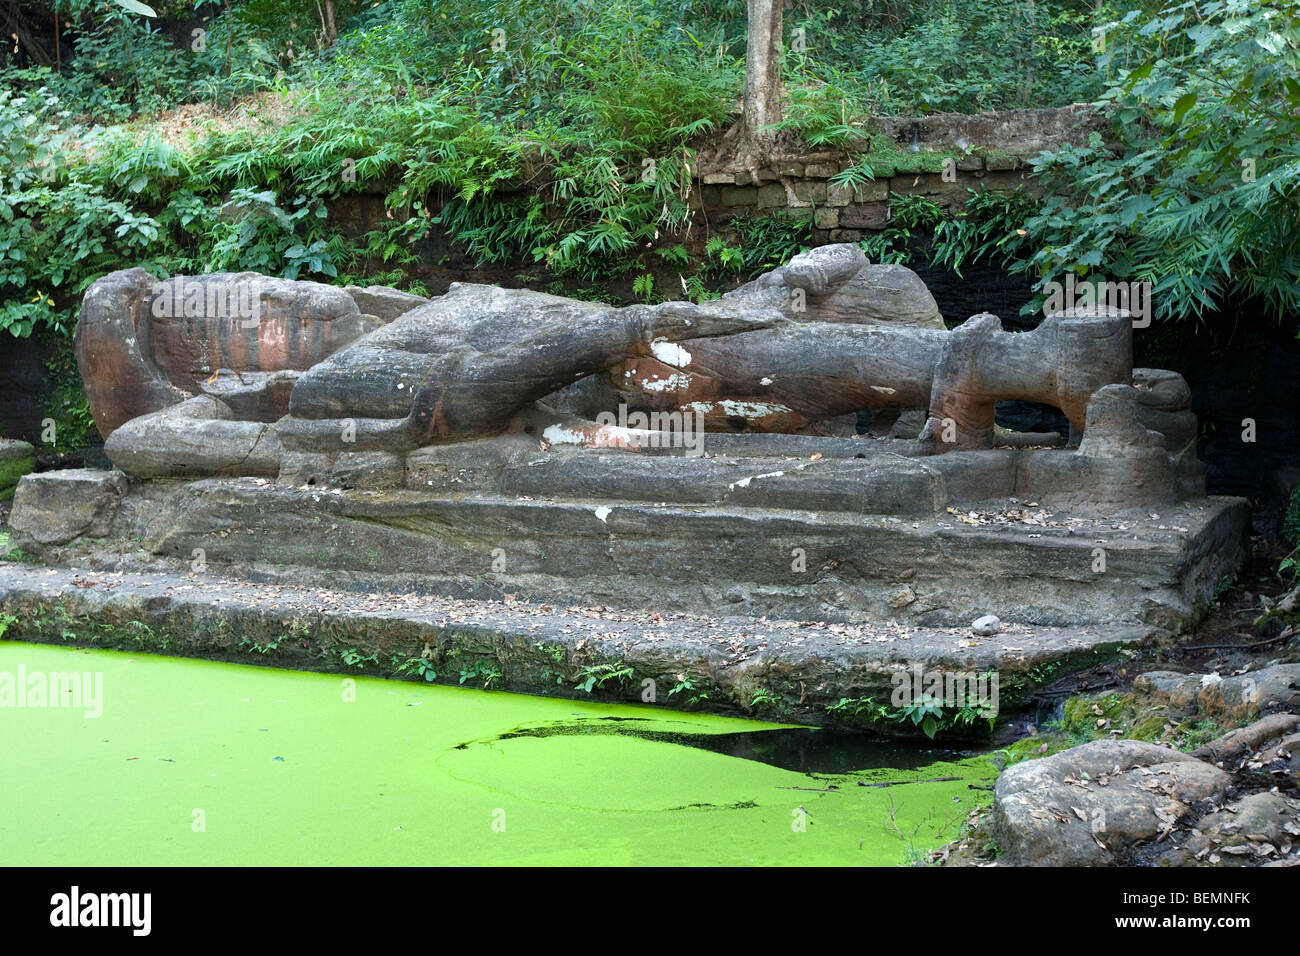 Bandhavgarh National Park India - Stock Image